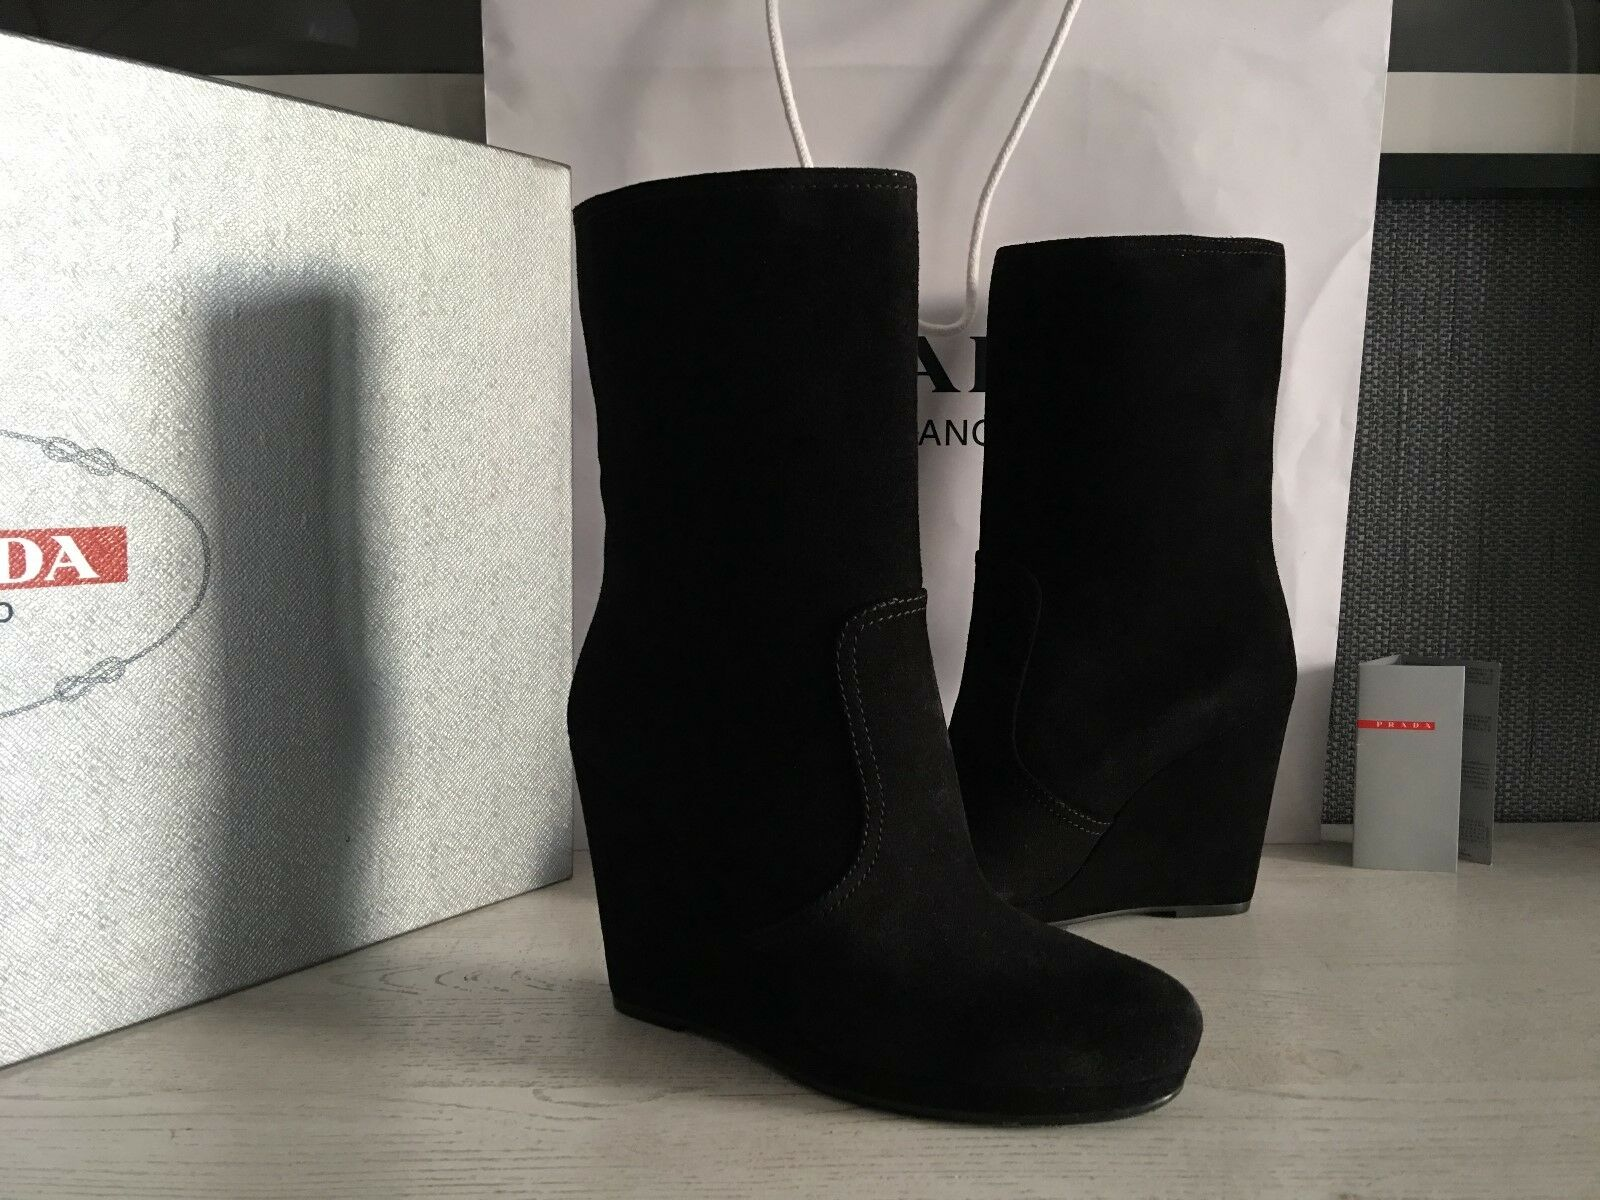 PRADA Women's Real Leather Boots  Sz   US 10,5 ( EU 40,5 )  NEW